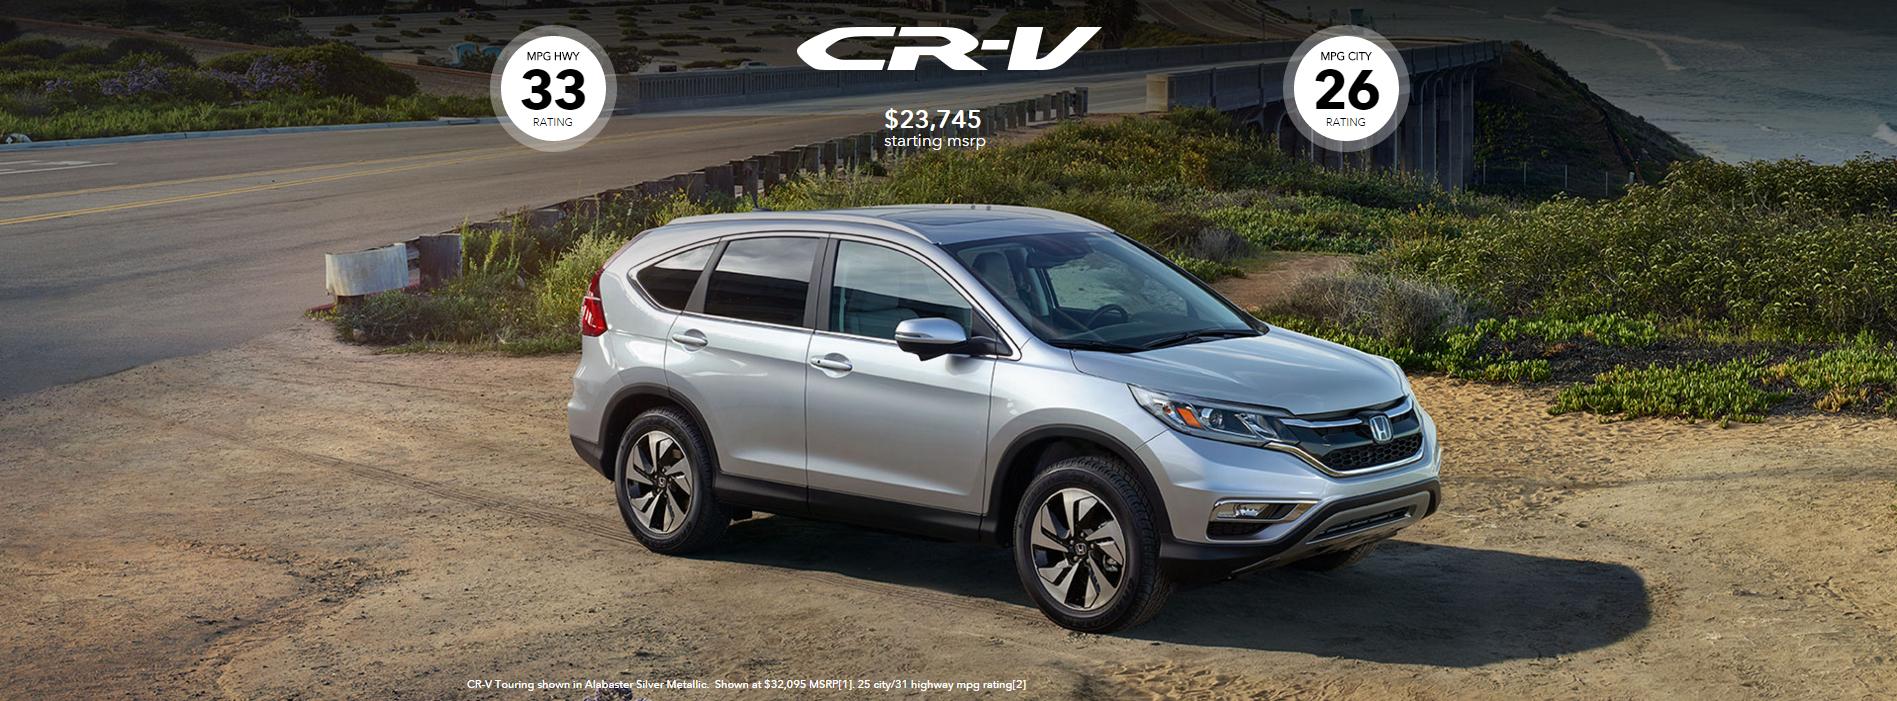 2016 Honda Crv Trim Level America S Favorite Compact Suv